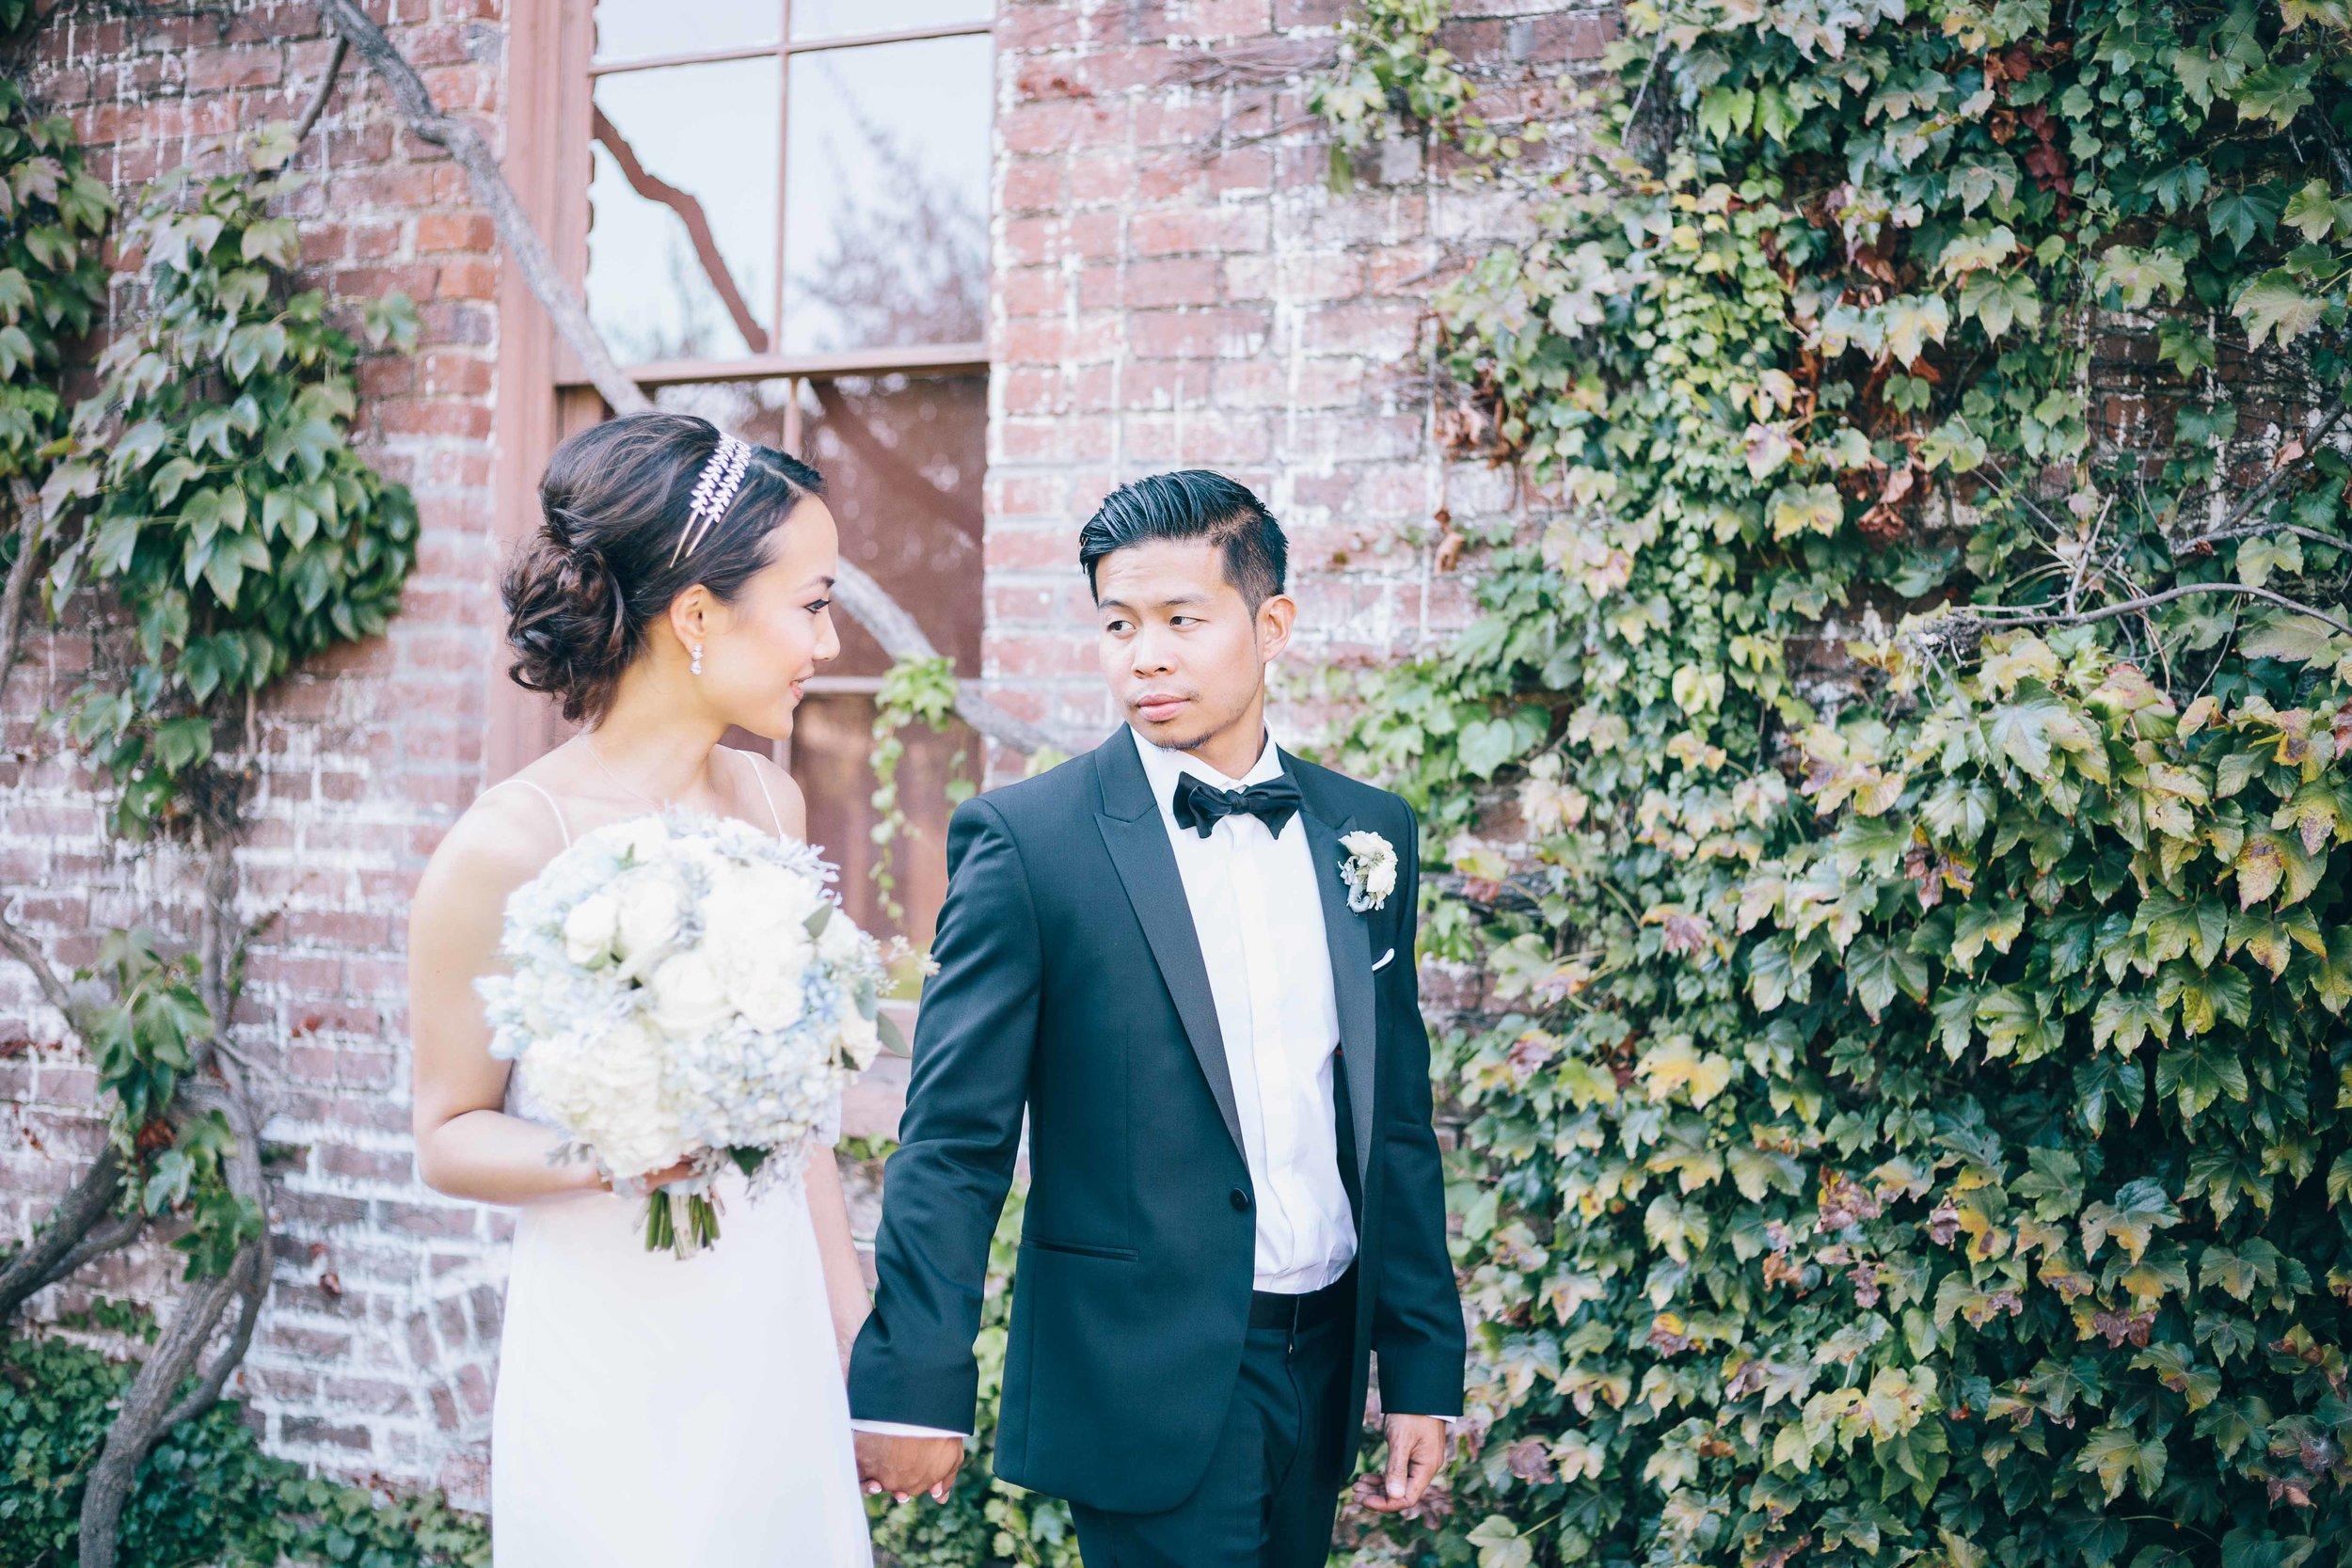 Westin Verasa Wedding at La Toque - JBJ Pictures Wedding Photographer in Napa Sonoma and San Francisco - 1 (17).jpg